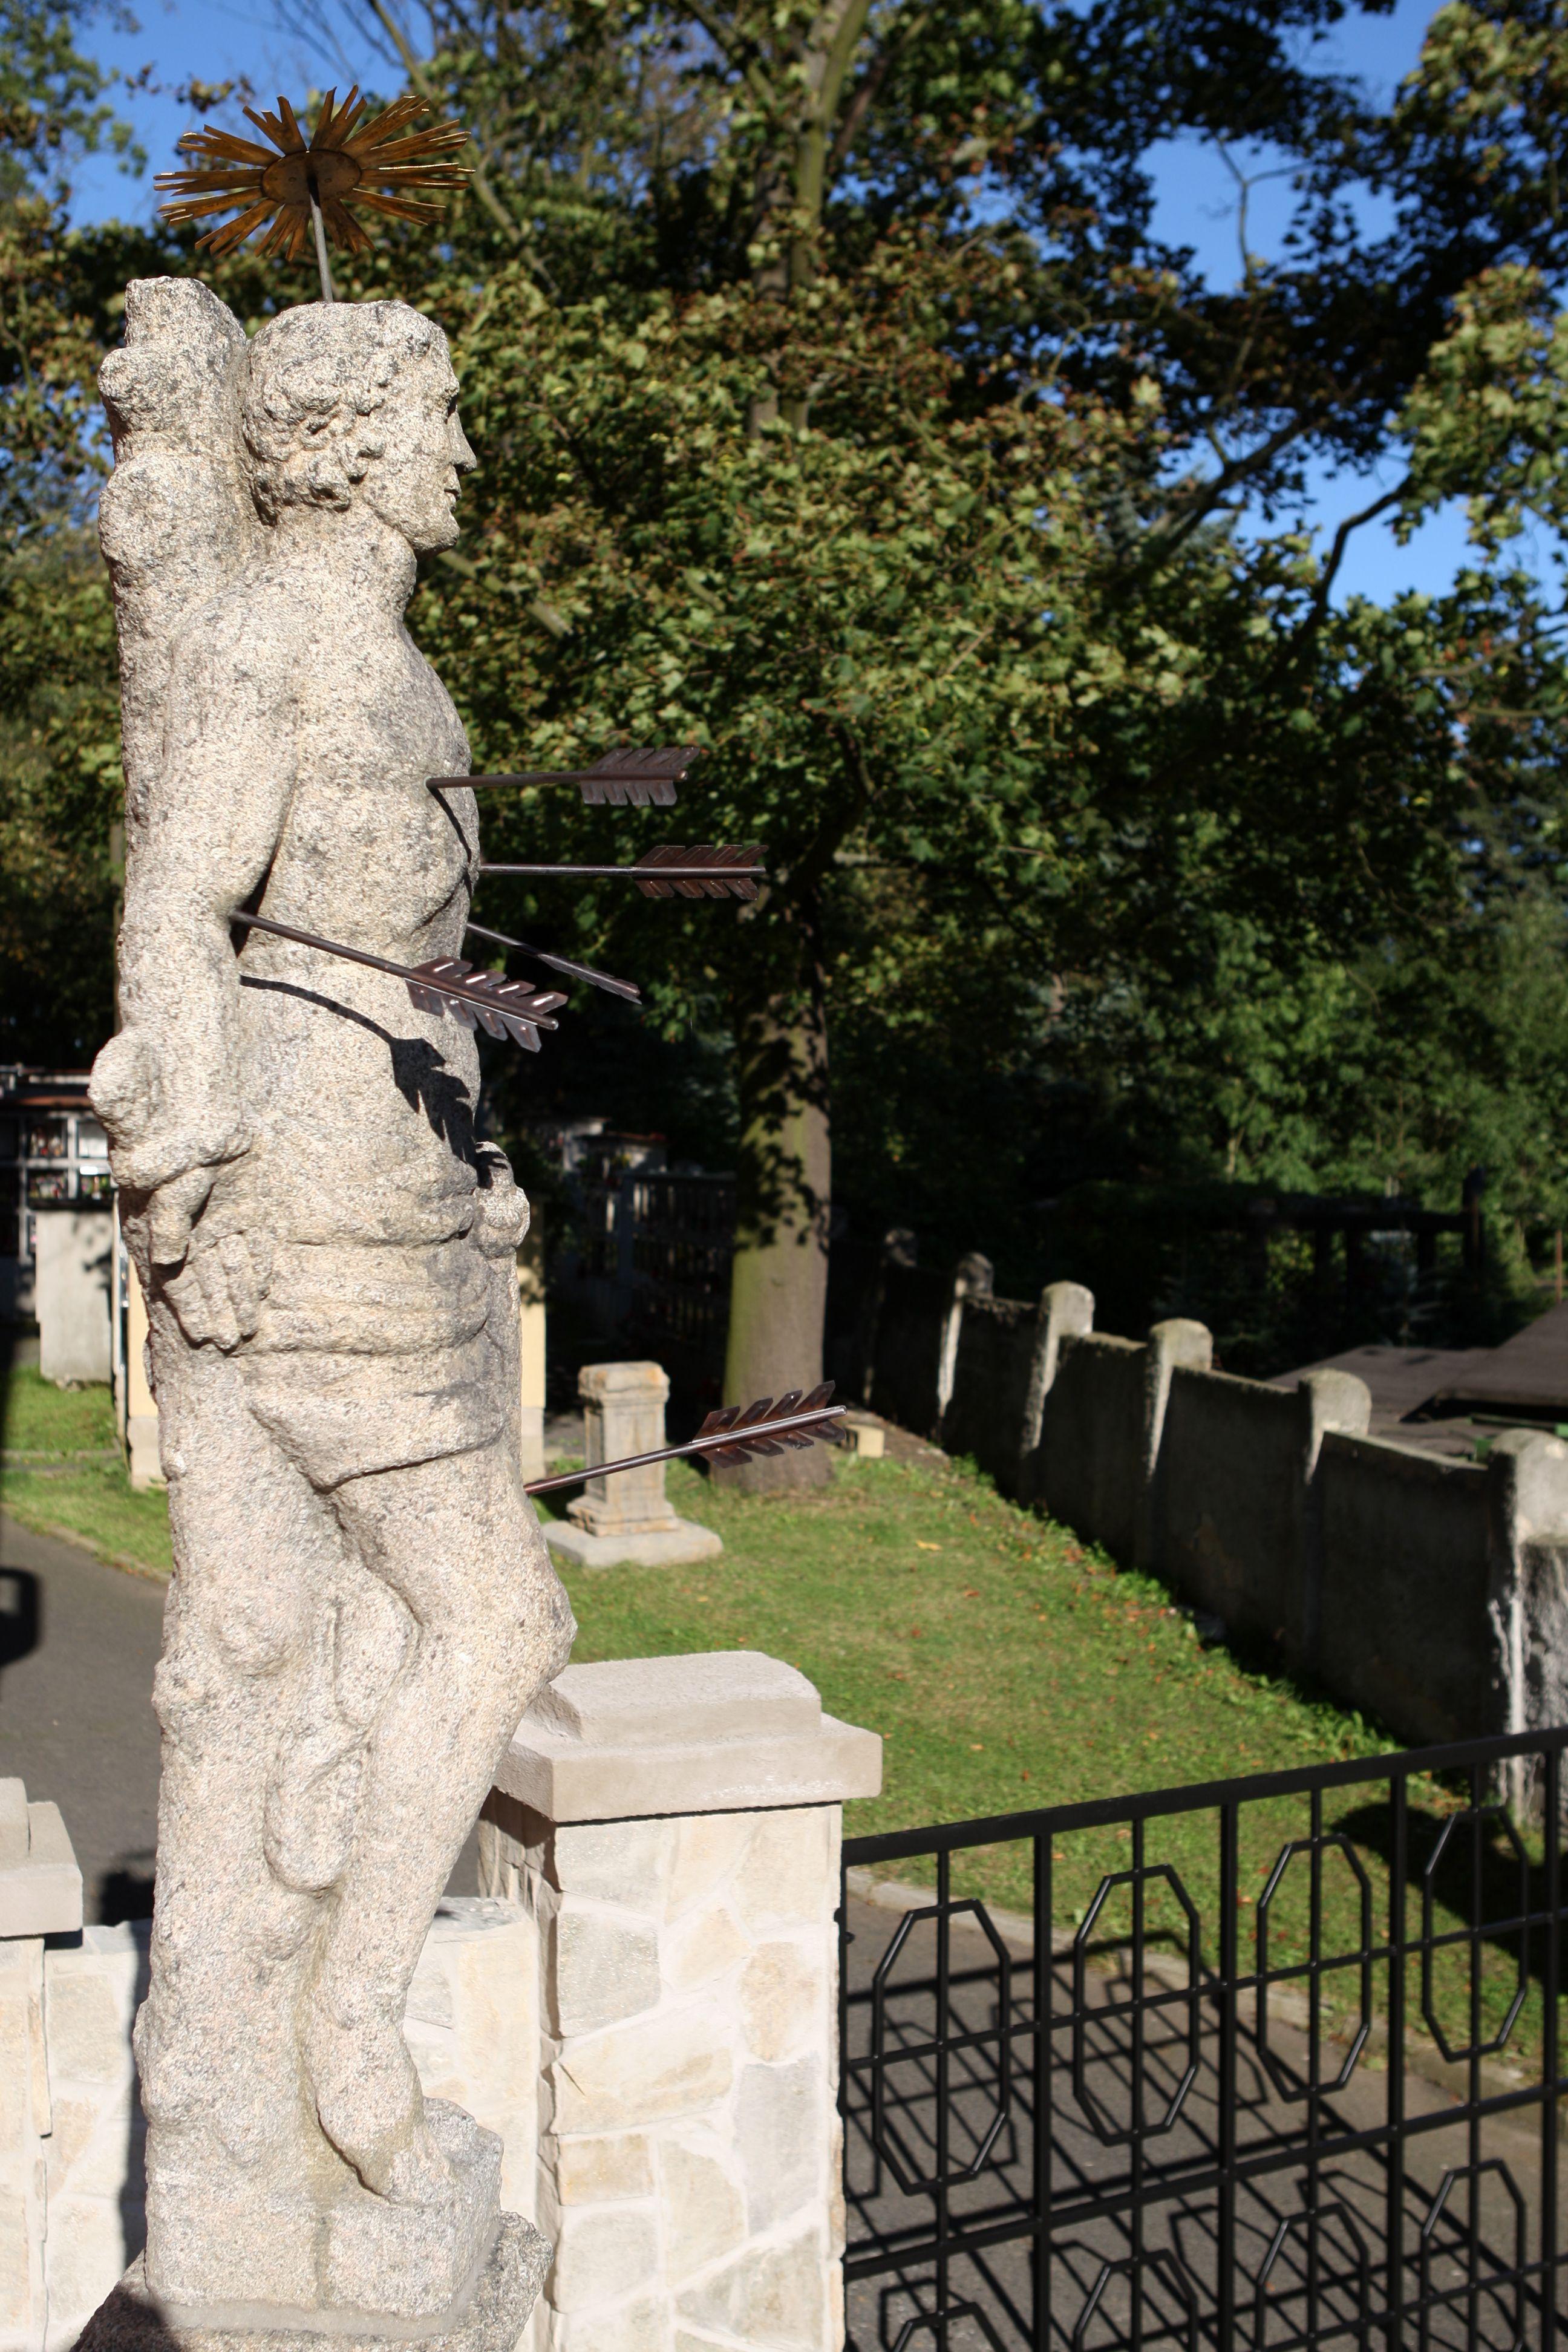 Statue of st. sebastian chodov